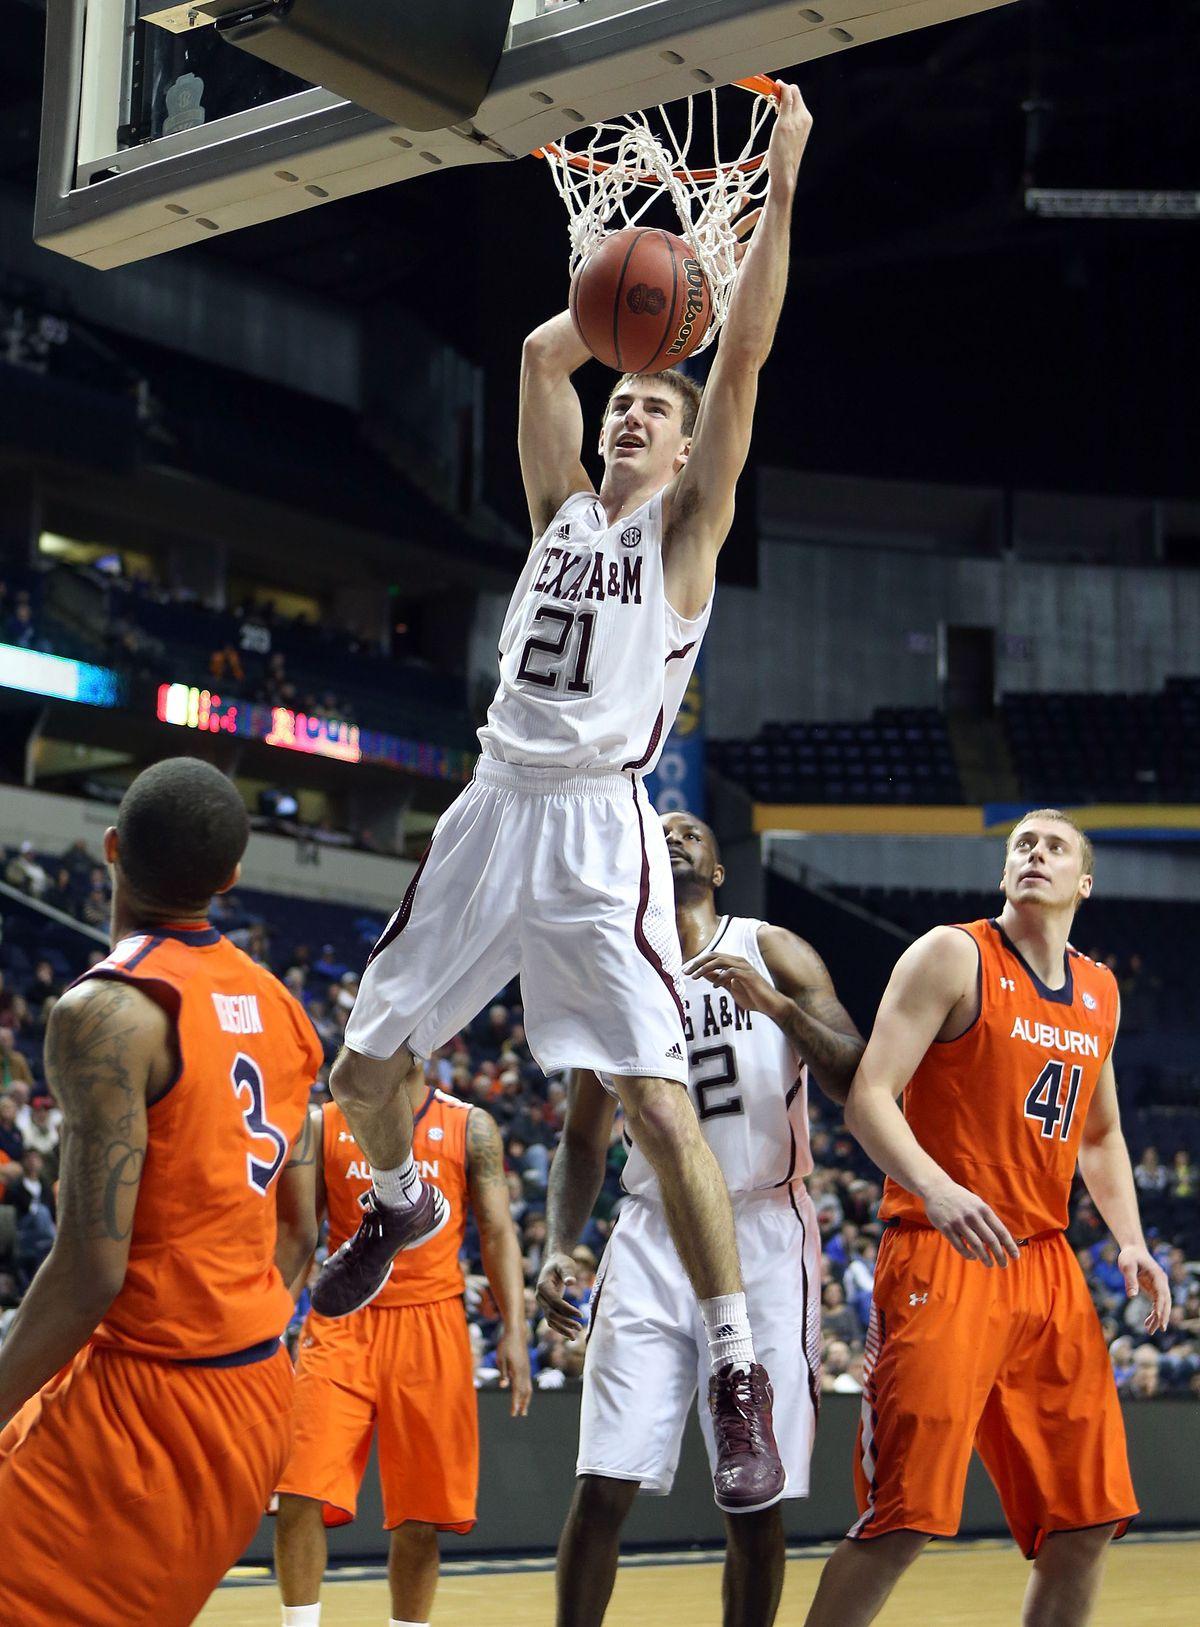 SEC Basketball Tournament - First Round-Auburn v Texas A&M